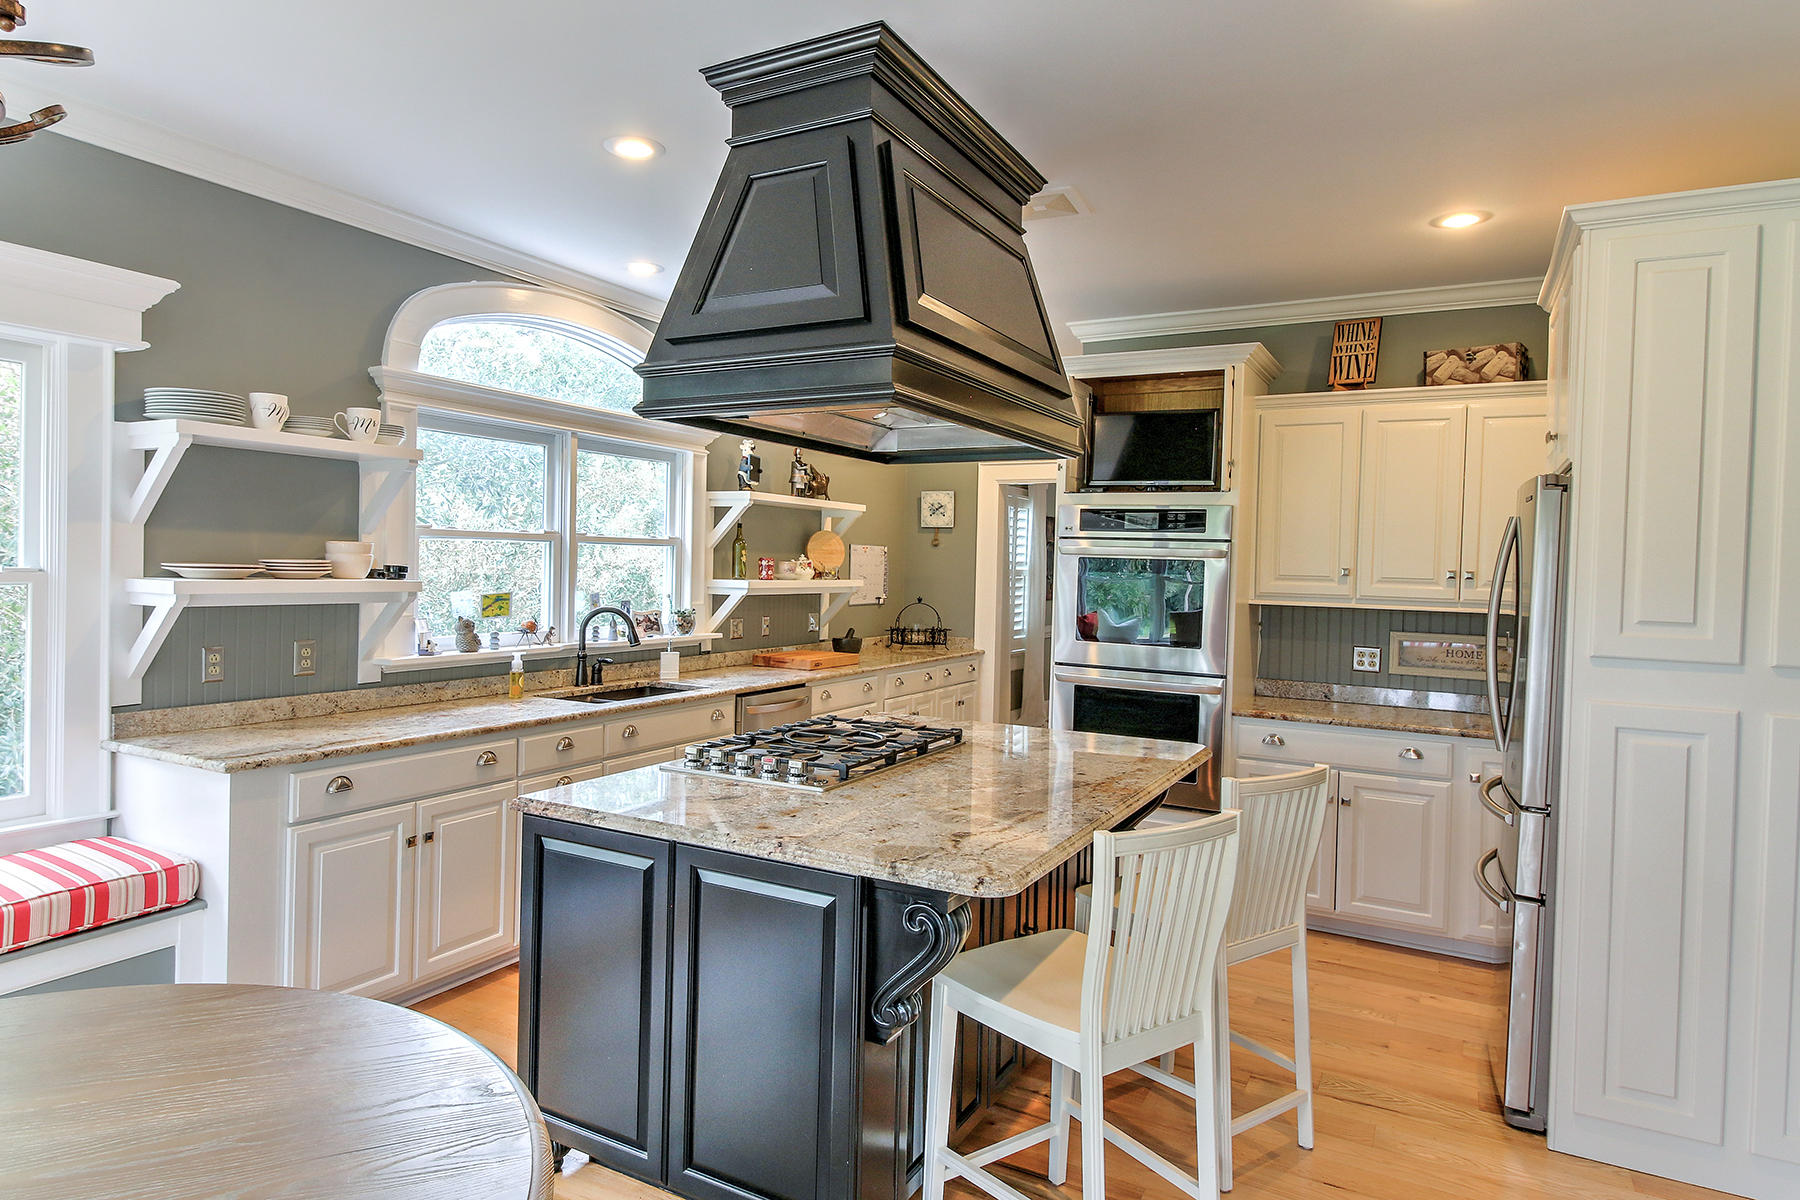 Salt Creek - kitchen 1 MLS.jpg